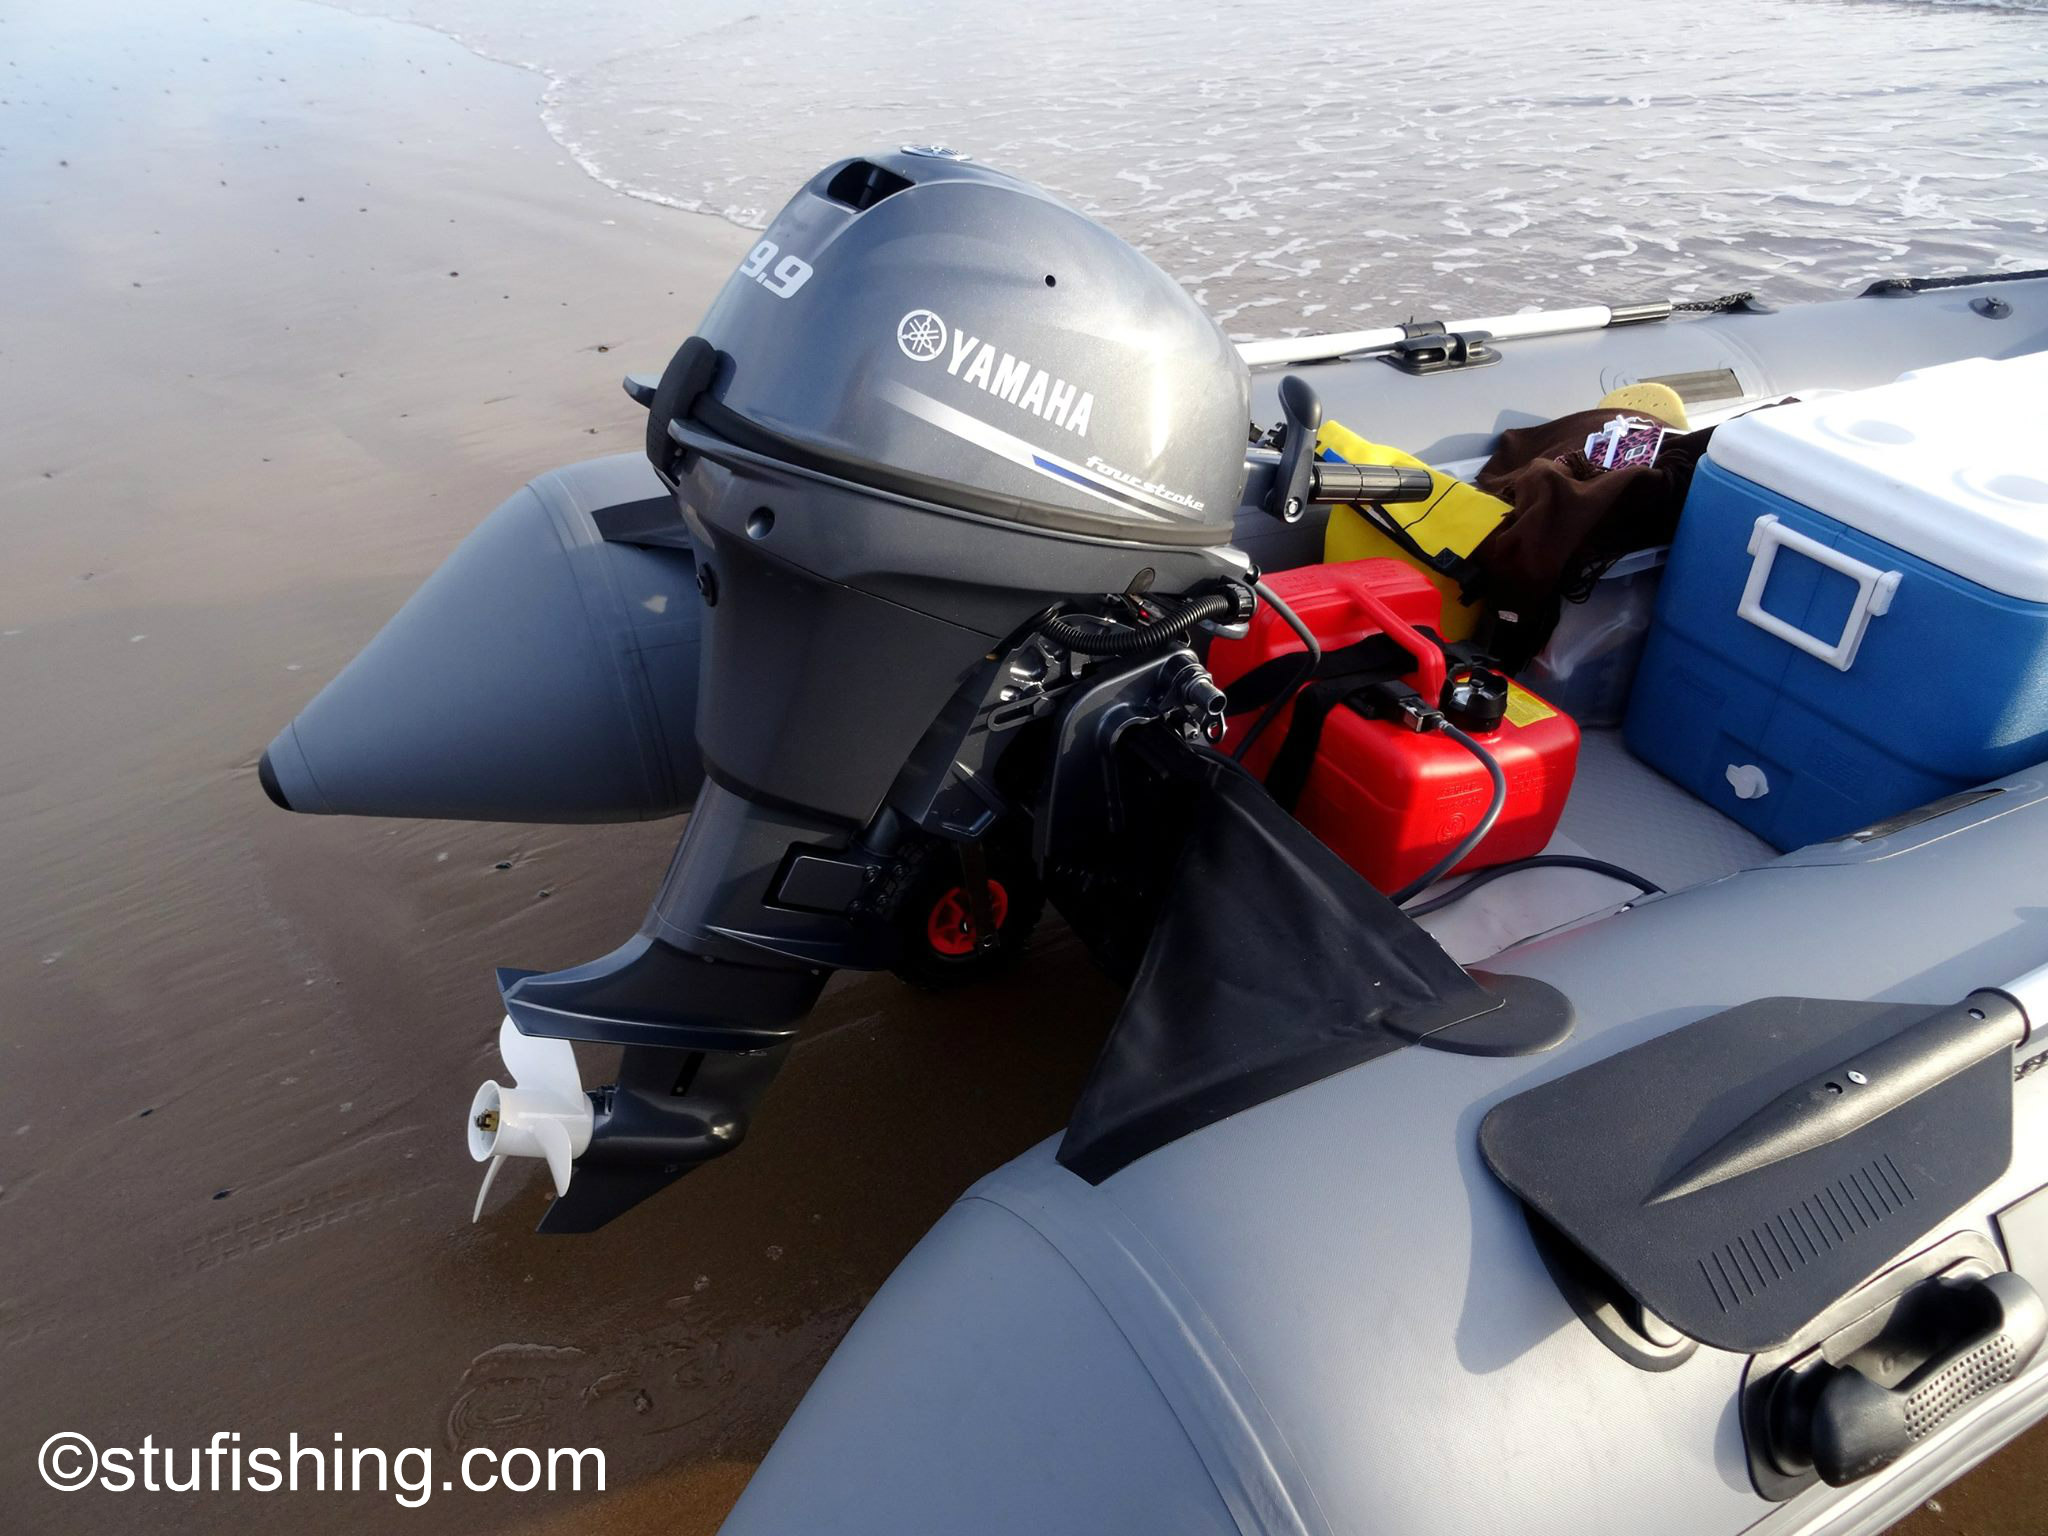 Yamaha 9.9 – The Yamaha 9.9 4 Stroke Outboard Motor